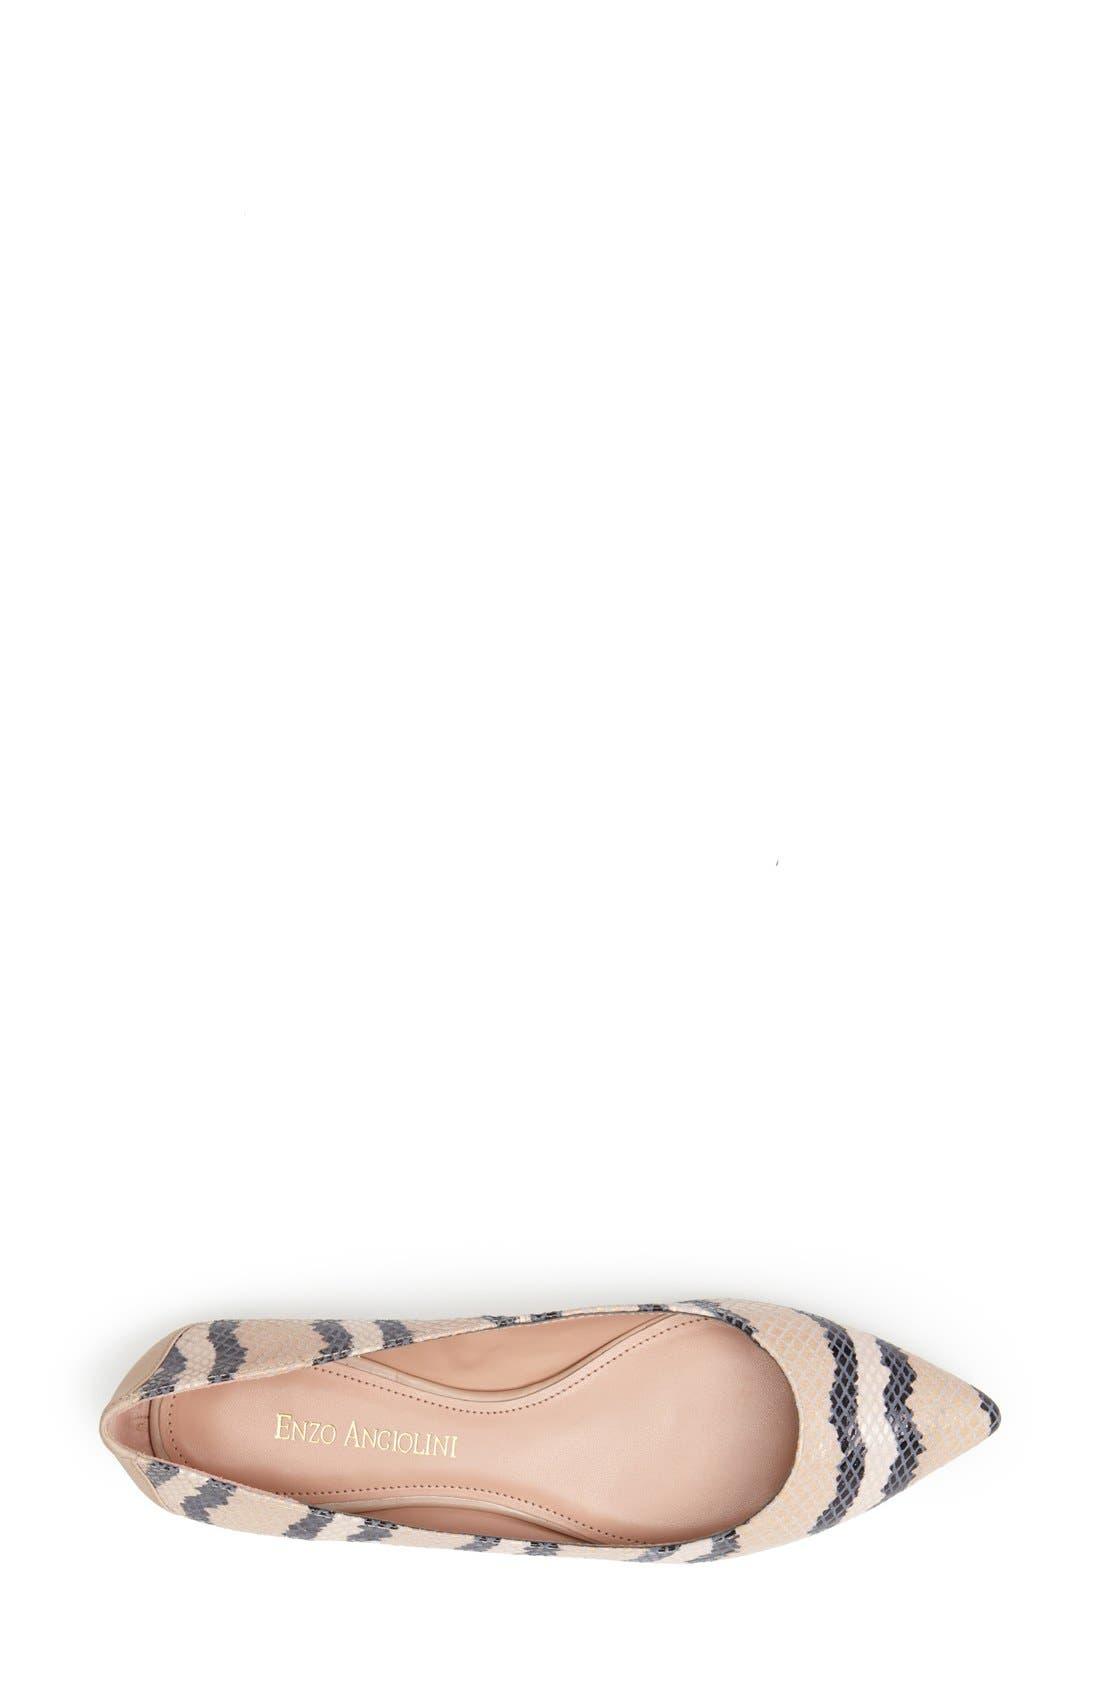 Alternate Image 3  - Enzo Angiolini 'Carolin' Pointy Toe Flat (Women)